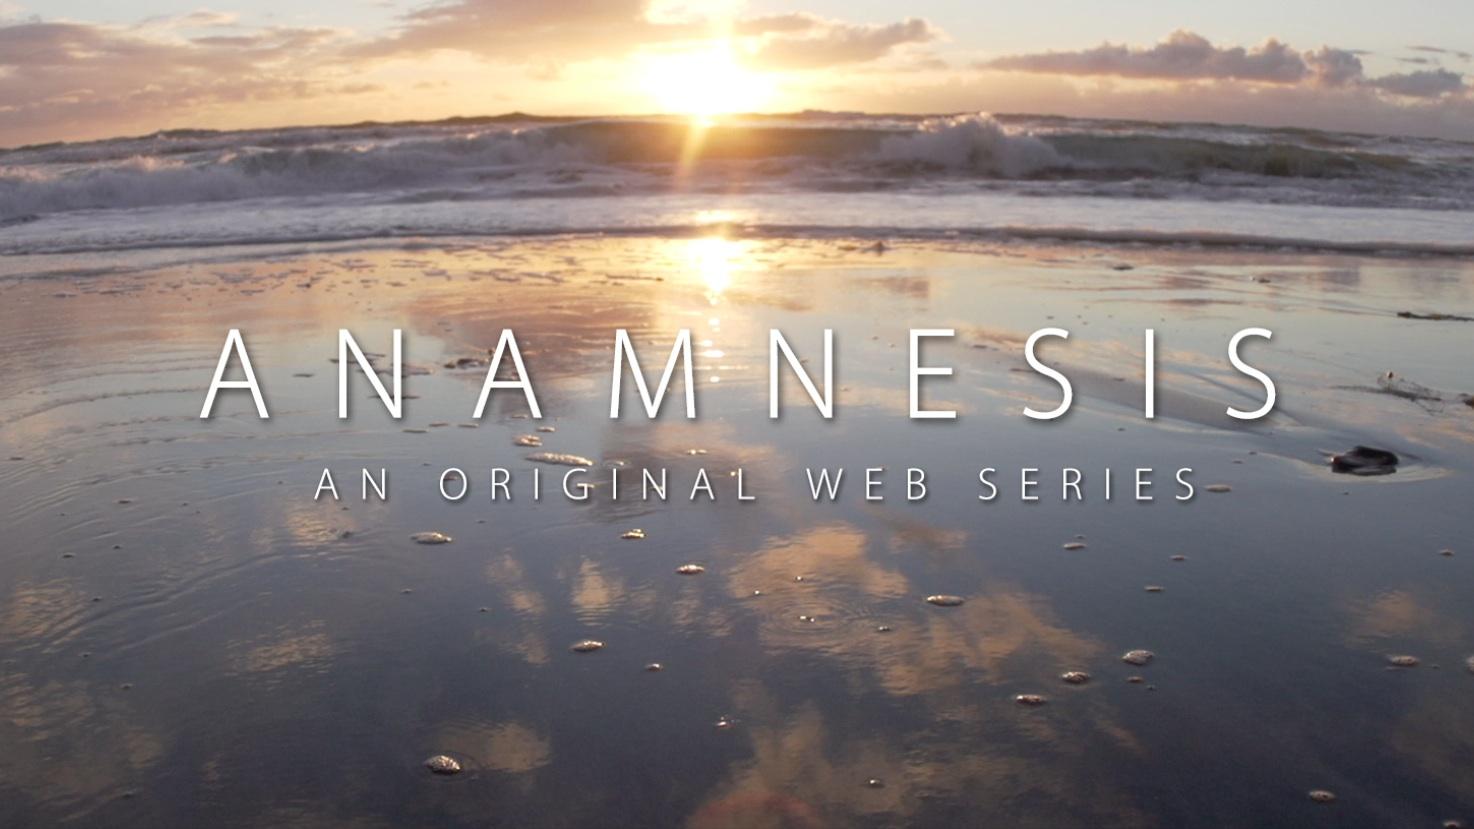 Anamnesis series trailer 2